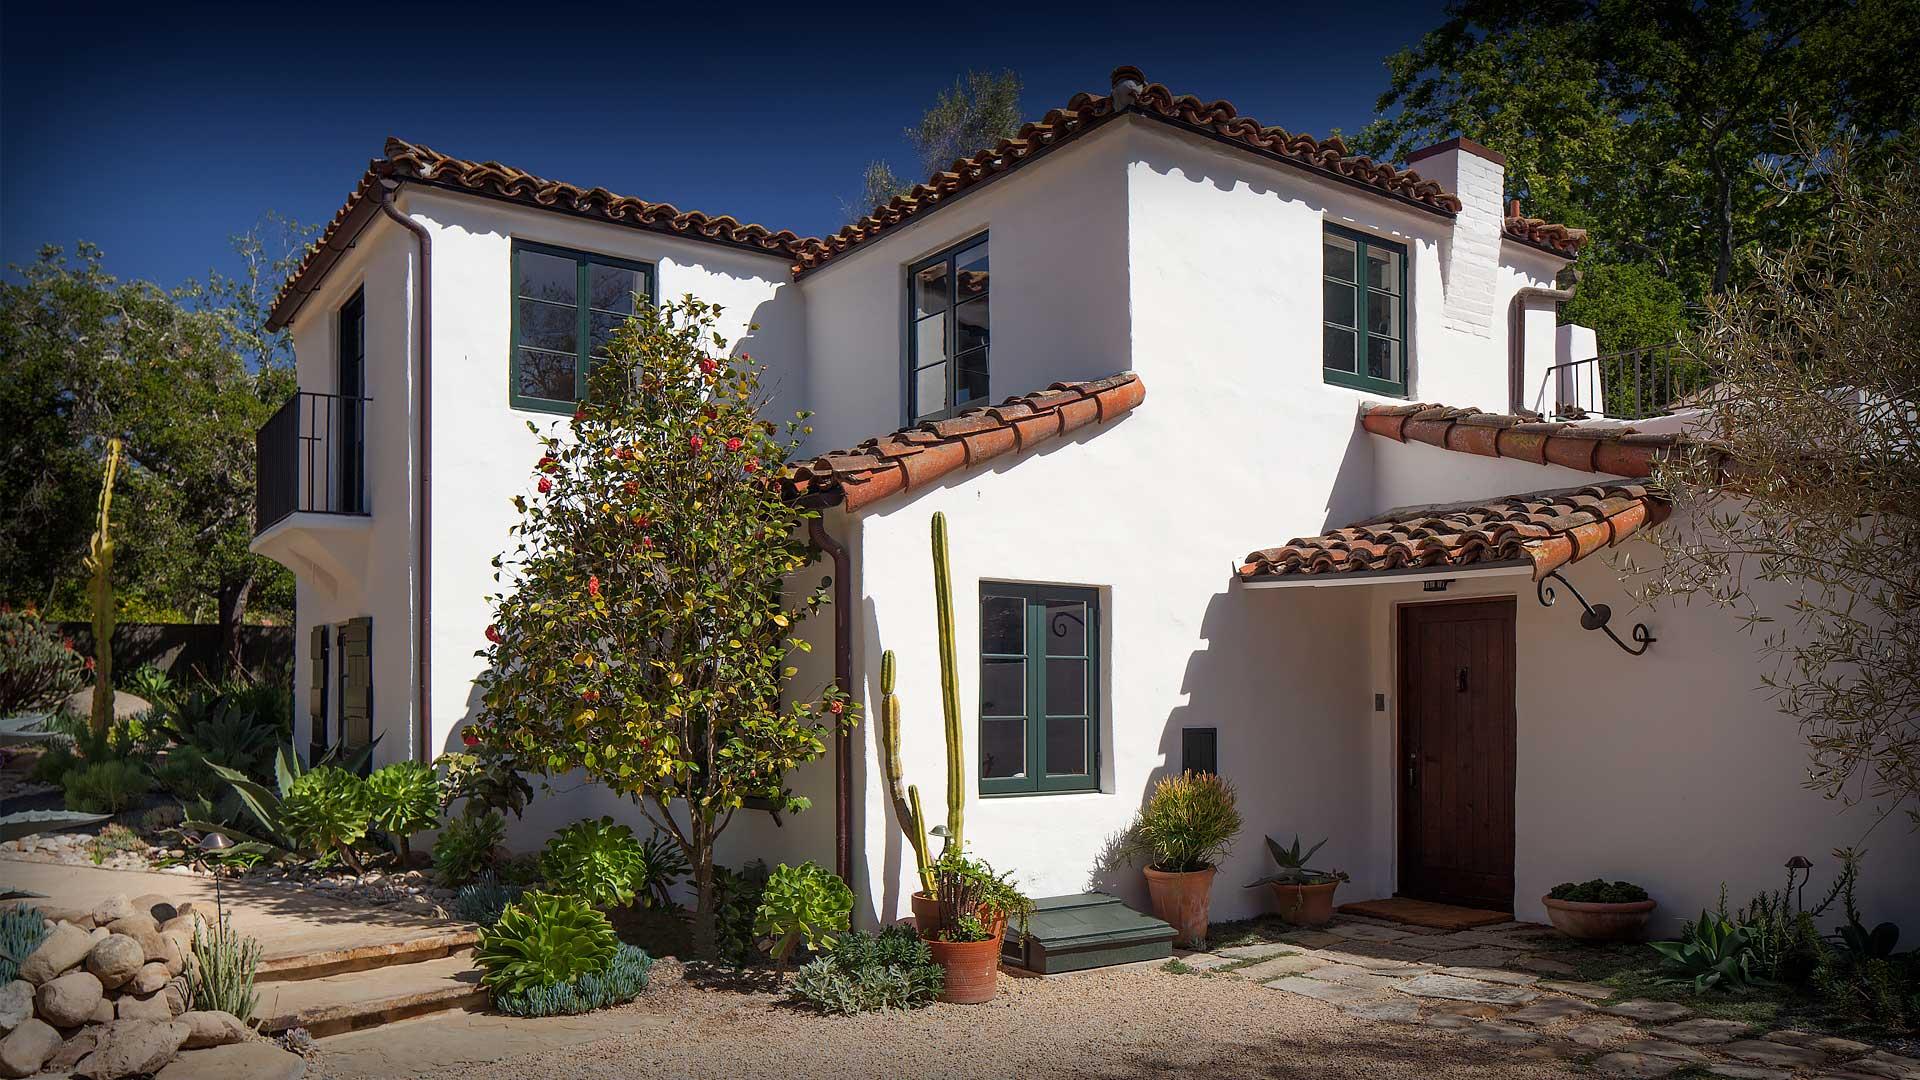 miradero-lane-house-1920×1080-07a